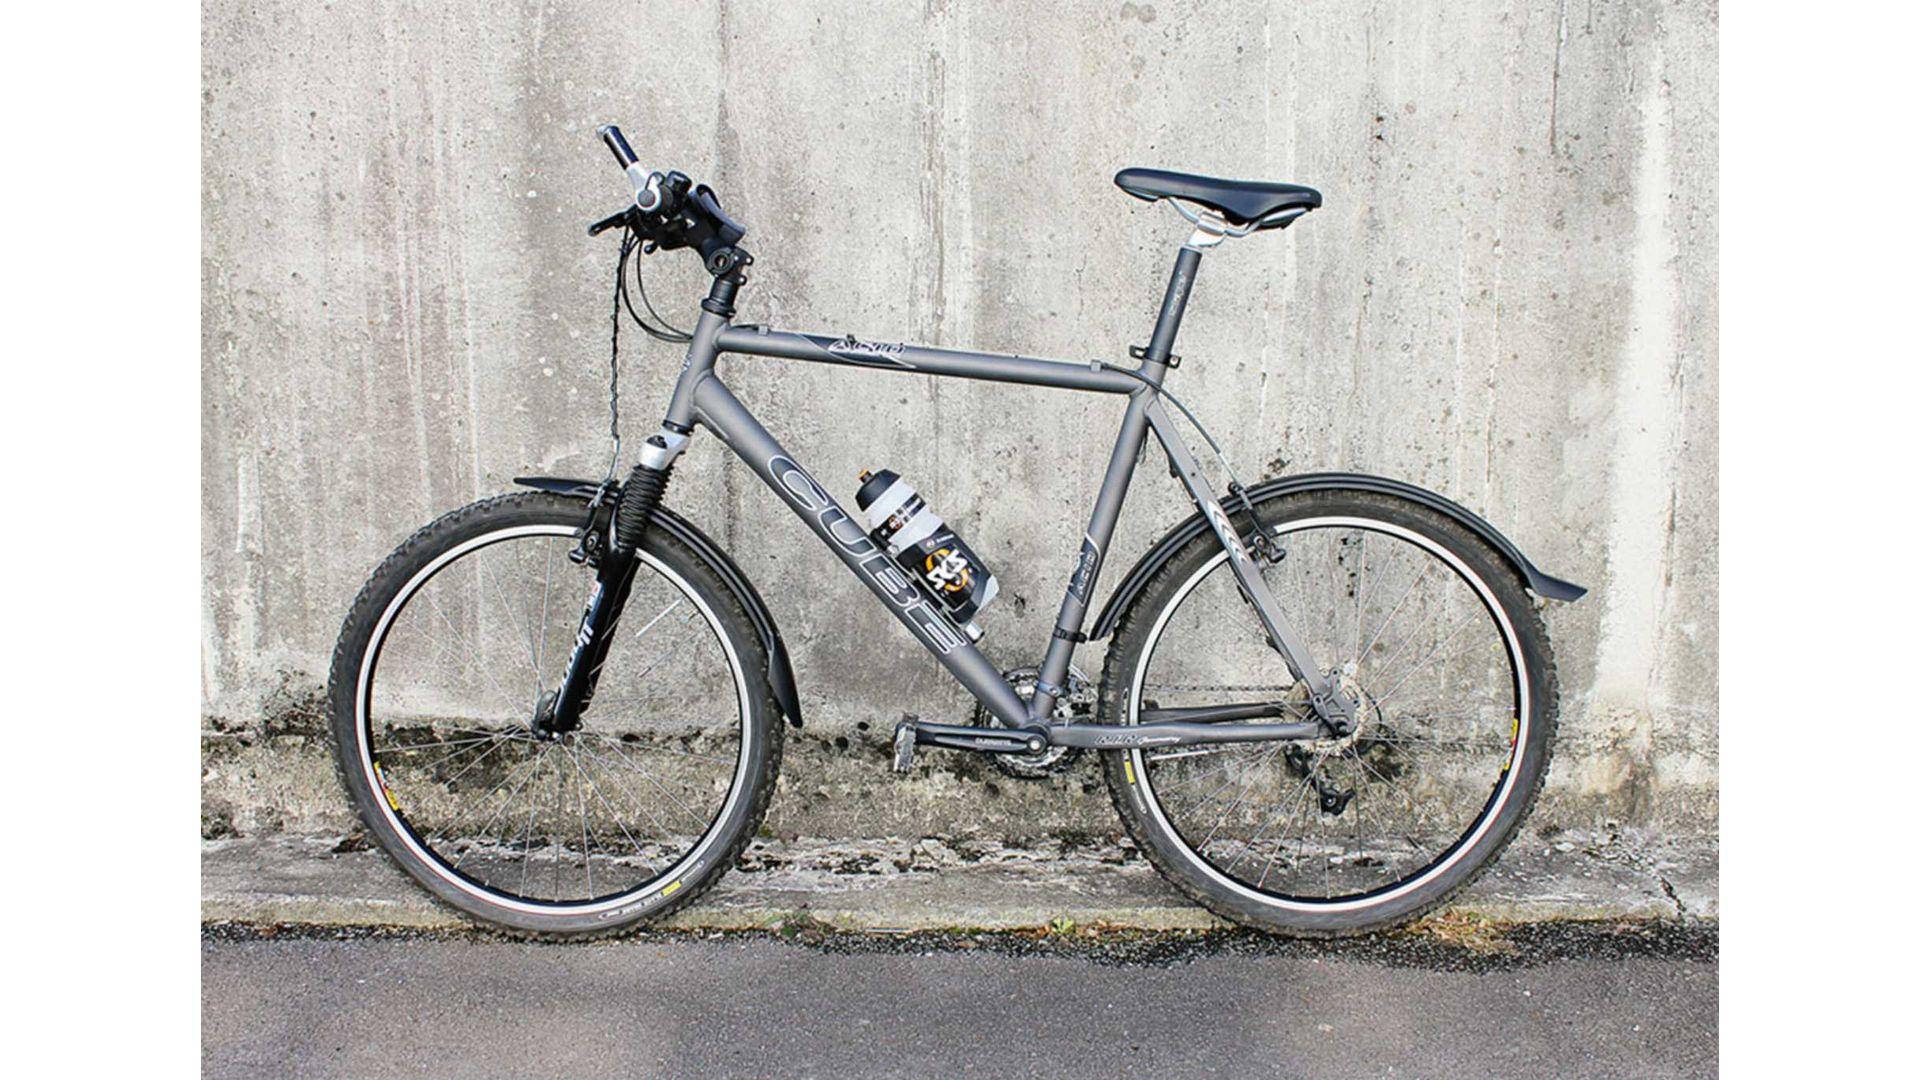 sks velo 65 mountain schutzblech set die fahrrad kette g nstig online kaufen die fahrrad kette. Black Bedroom Furniture Sets. Home Design Ideas